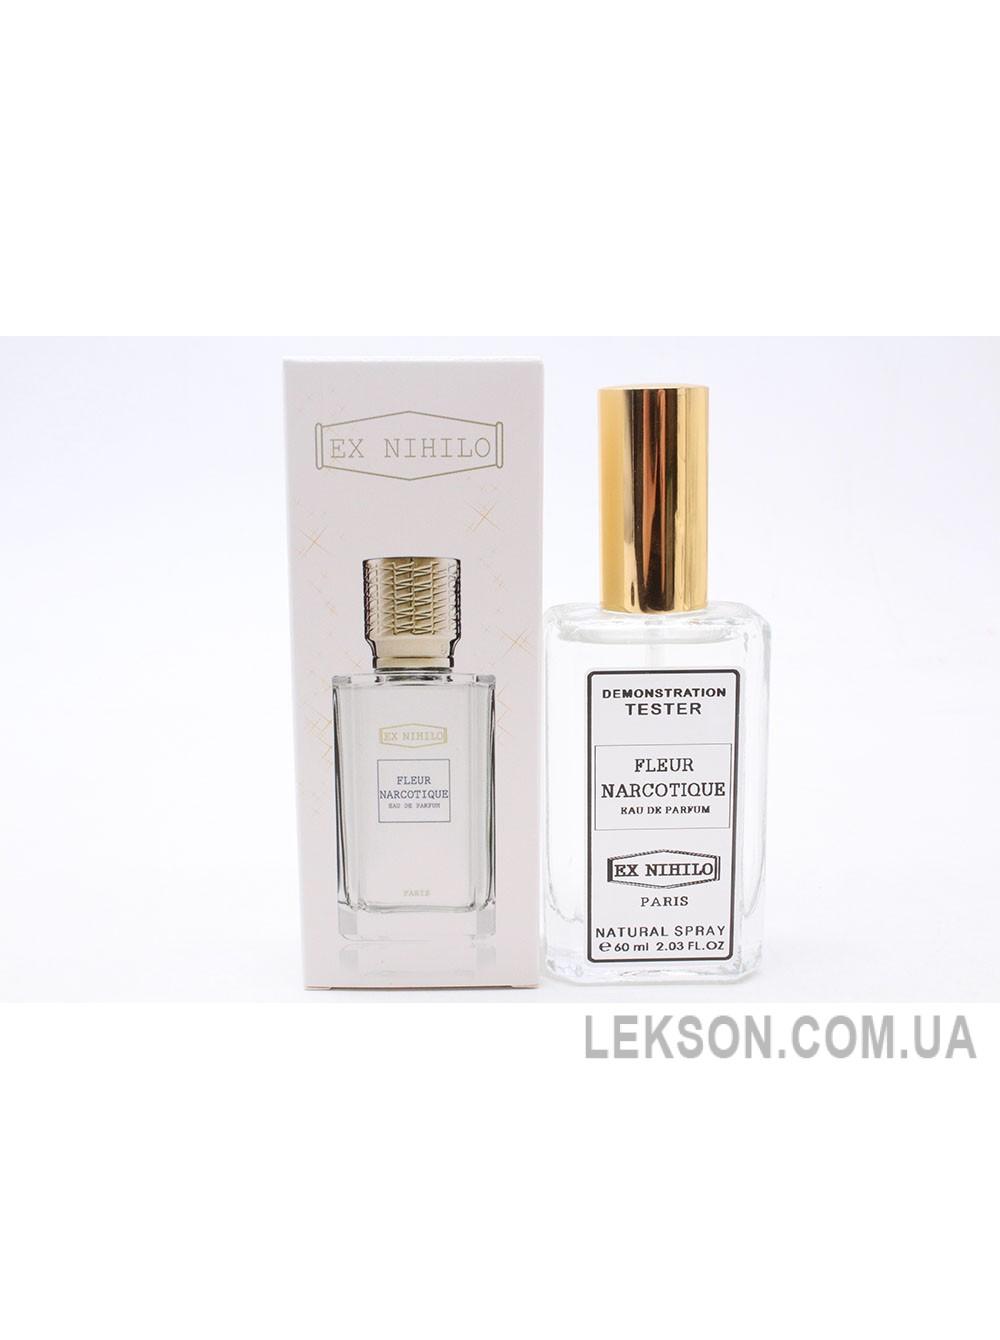 Женский парфюм тестер: Ex nihilo fleur narcotique 60мл